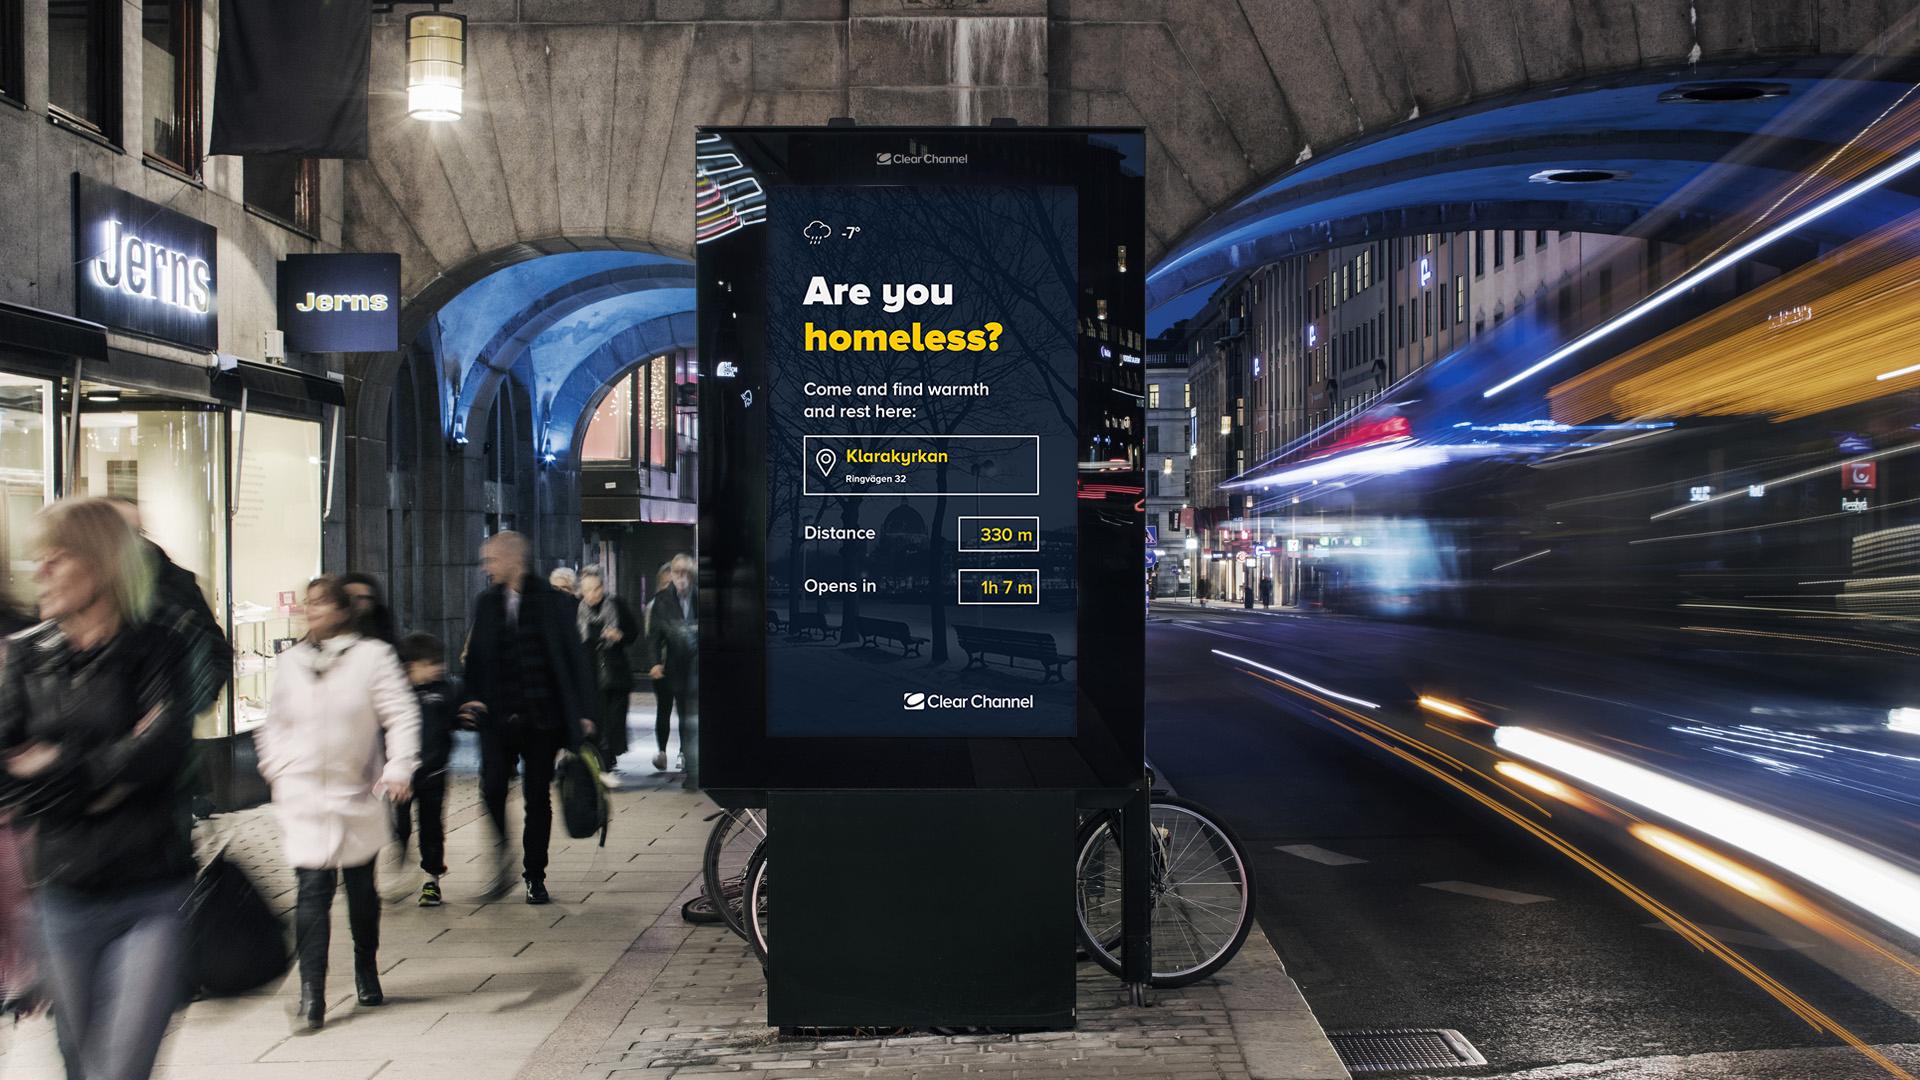 Stockholm's digital billboards now help the homeless find shelter during freezing weather